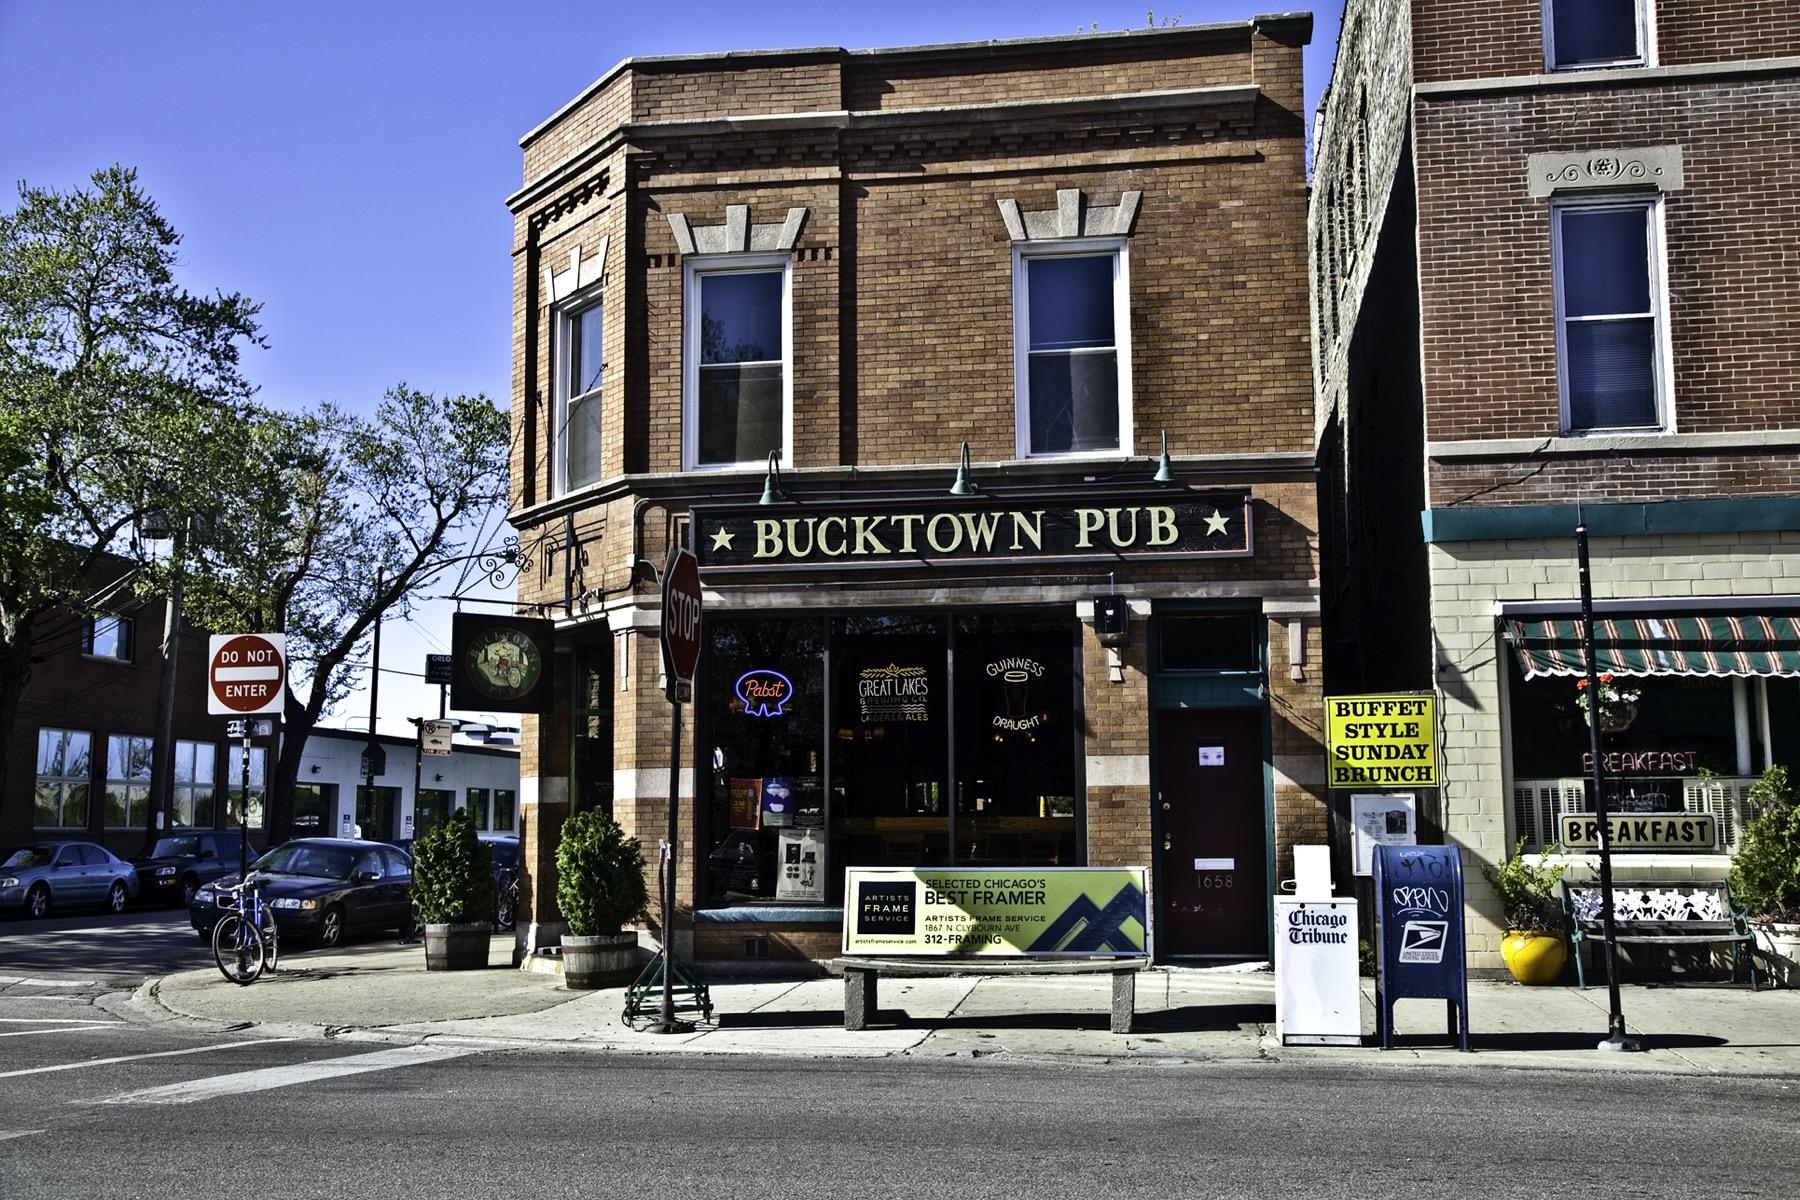 Bucktown Tap